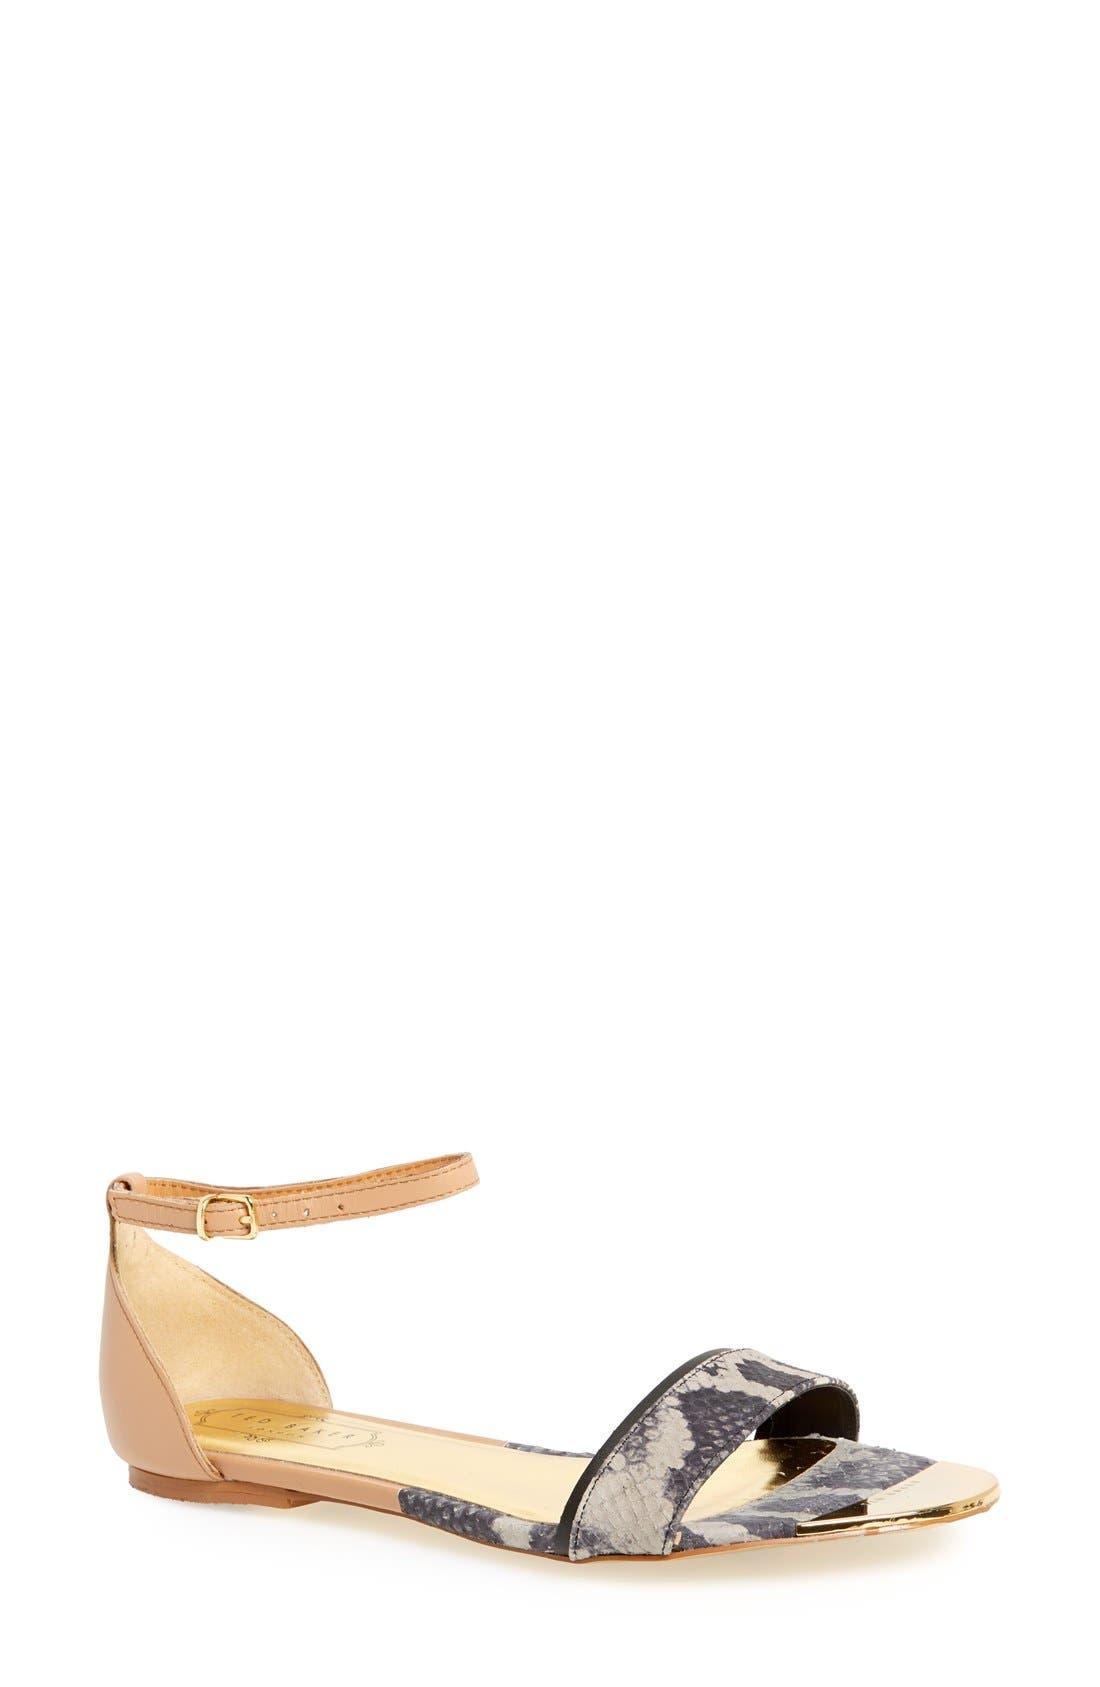 Main Image - Ted Baker London 'Nayna' Sandal